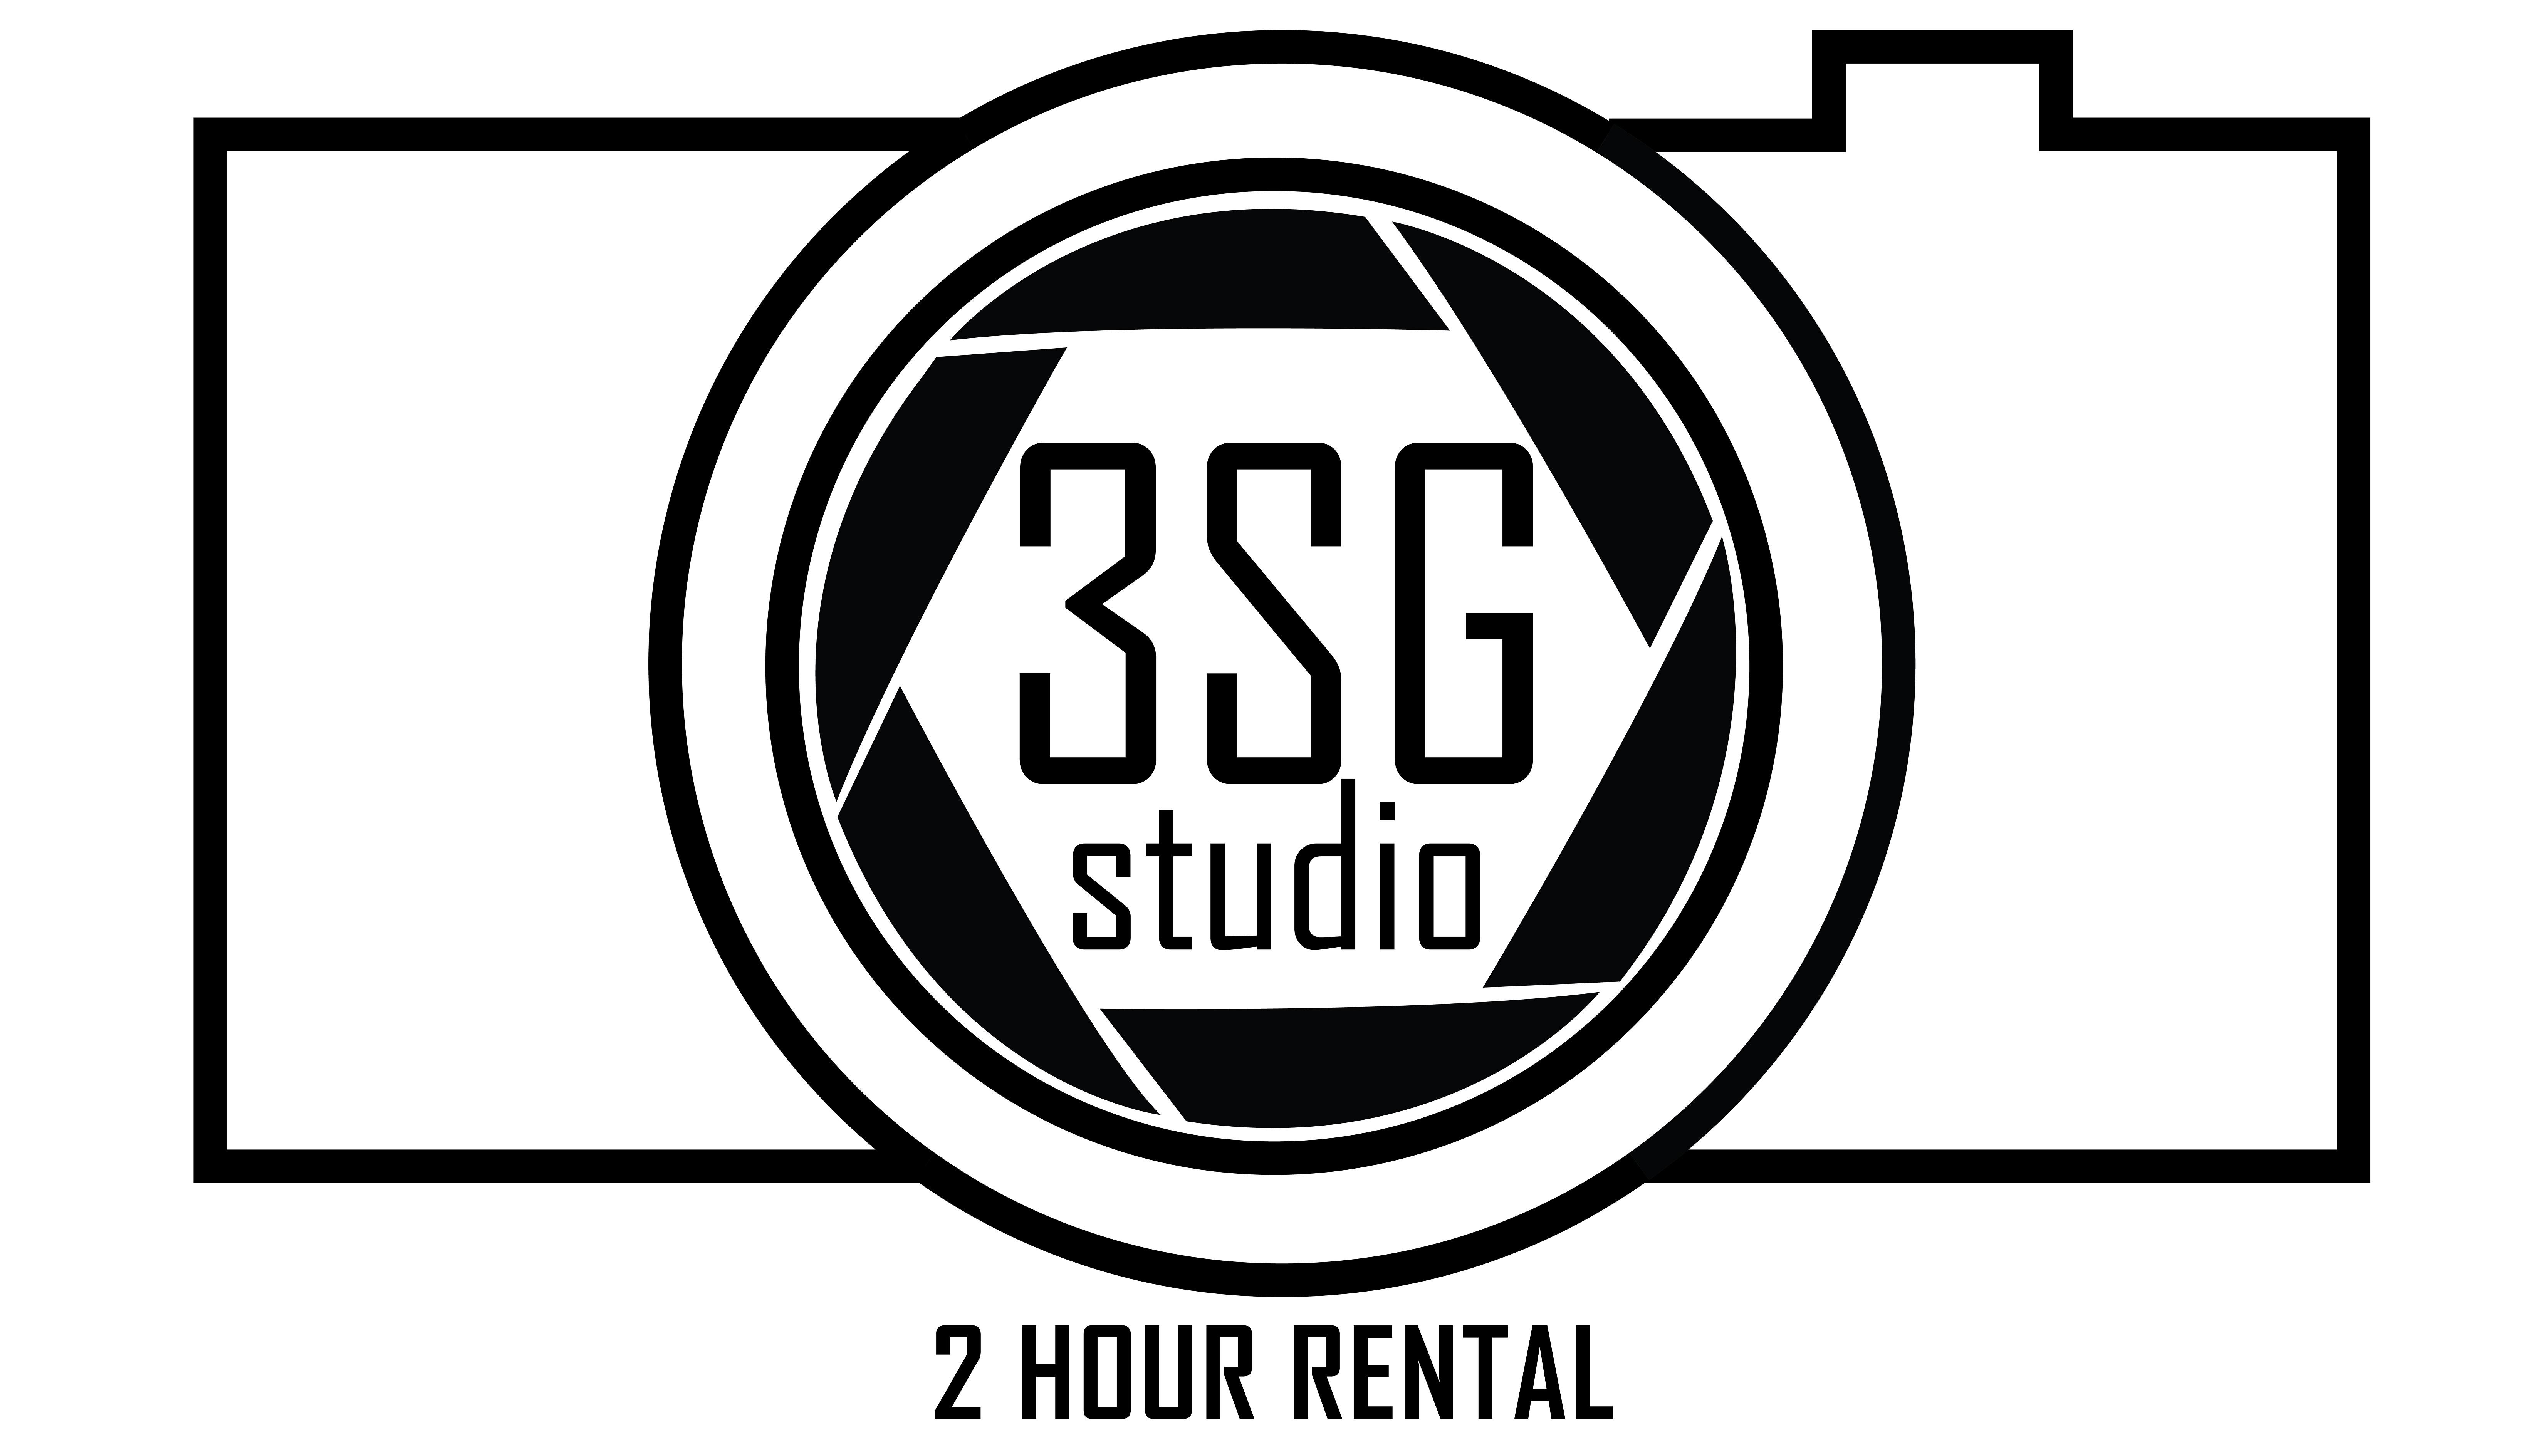 2 Hour Rental